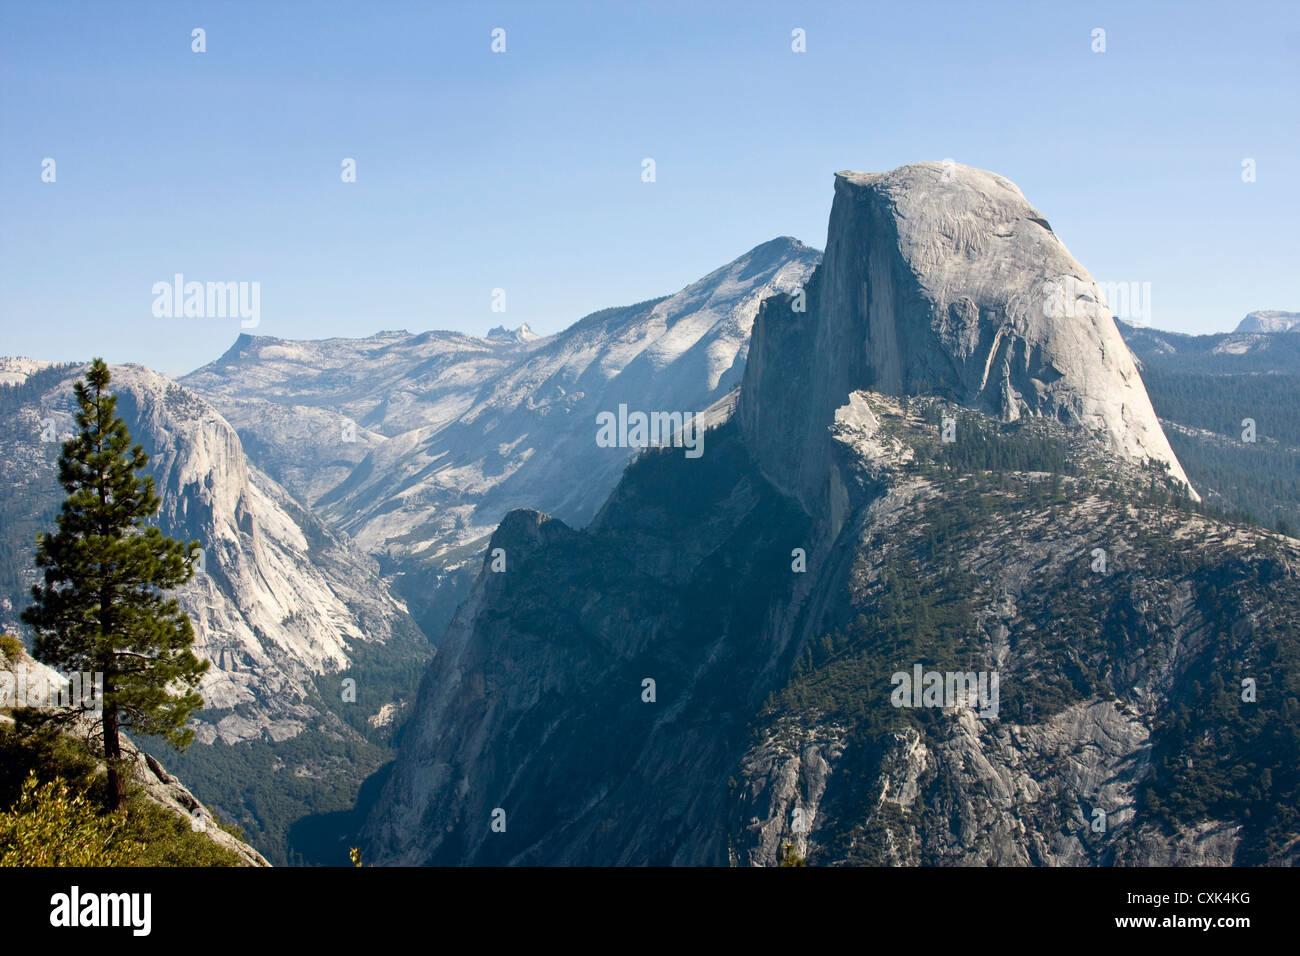 half dome mountain in yosemite national park in california - Stock Image